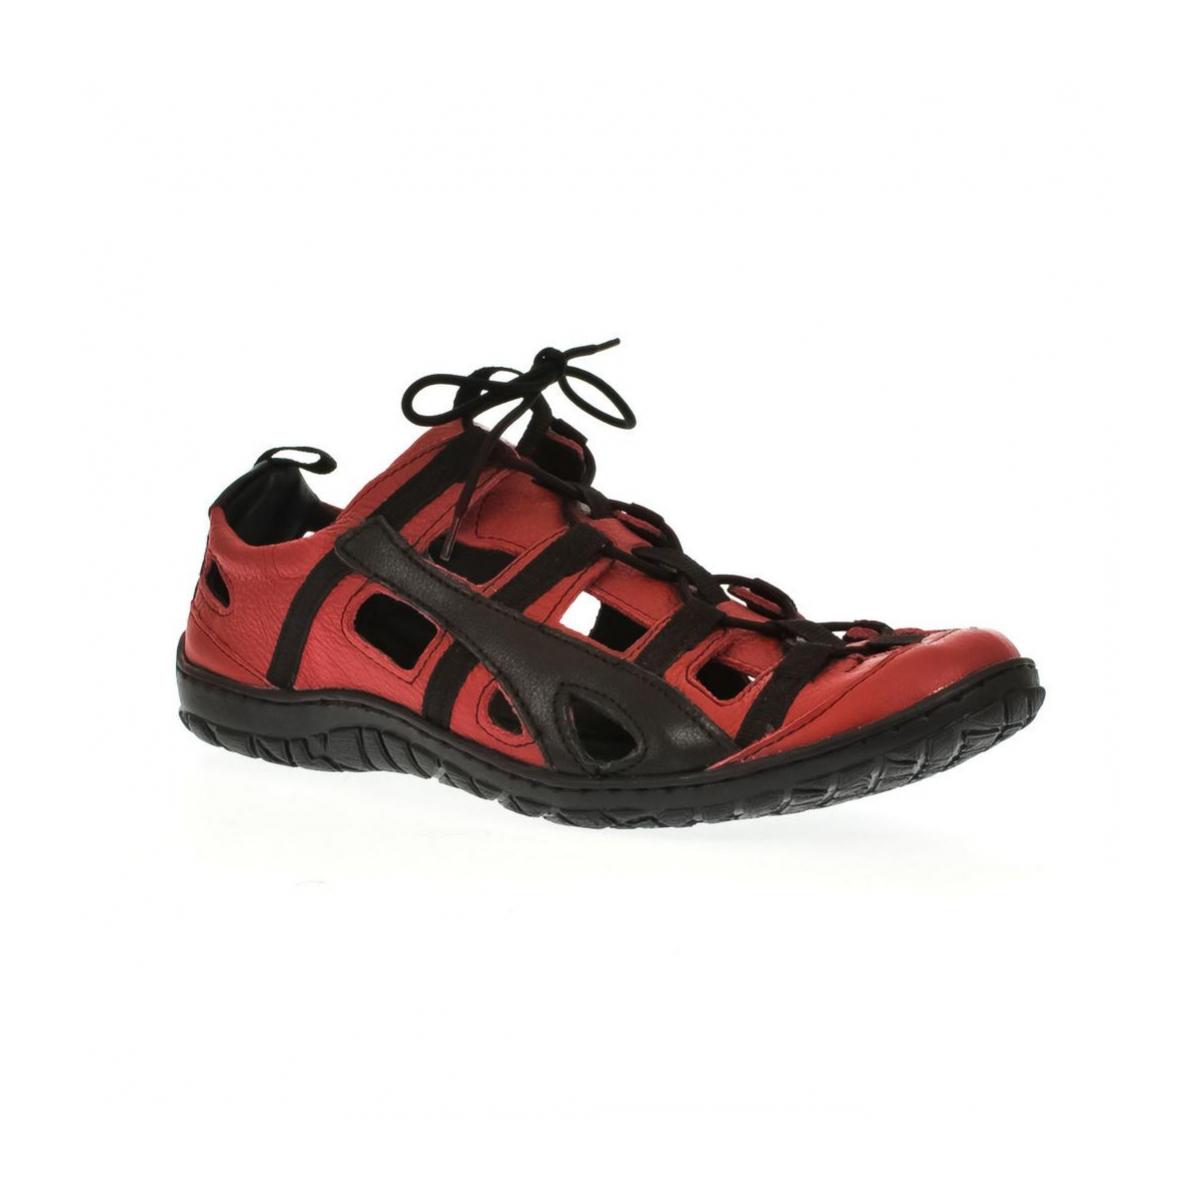 Pánske kožené červené topánky VINCENT - 4 b219ee7121a